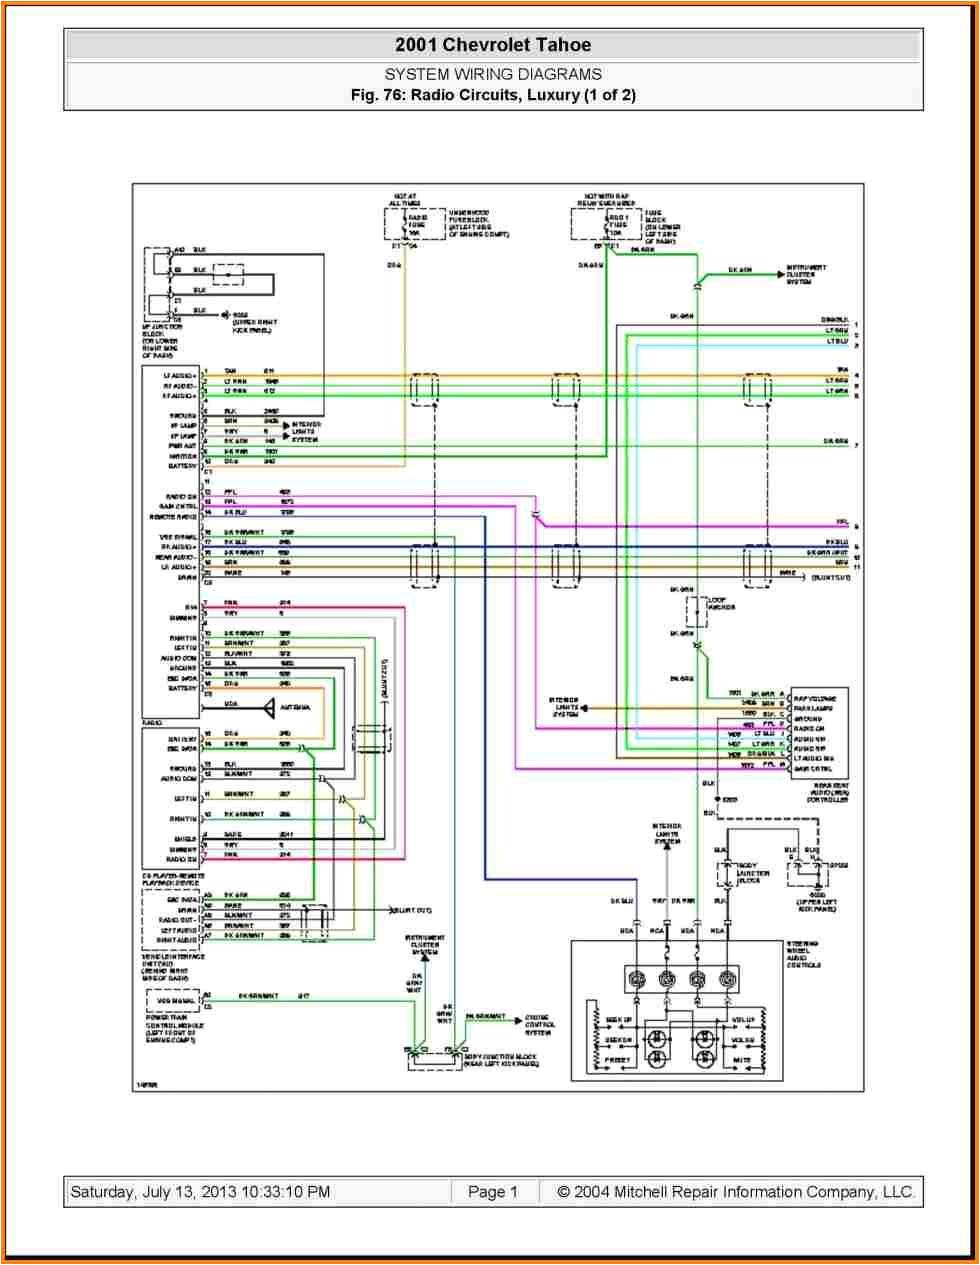 Sony Cdx Gt620ip Wiring Diagram 2004 Chevy Silverado Instrument Cluster Wirin Wiring Library